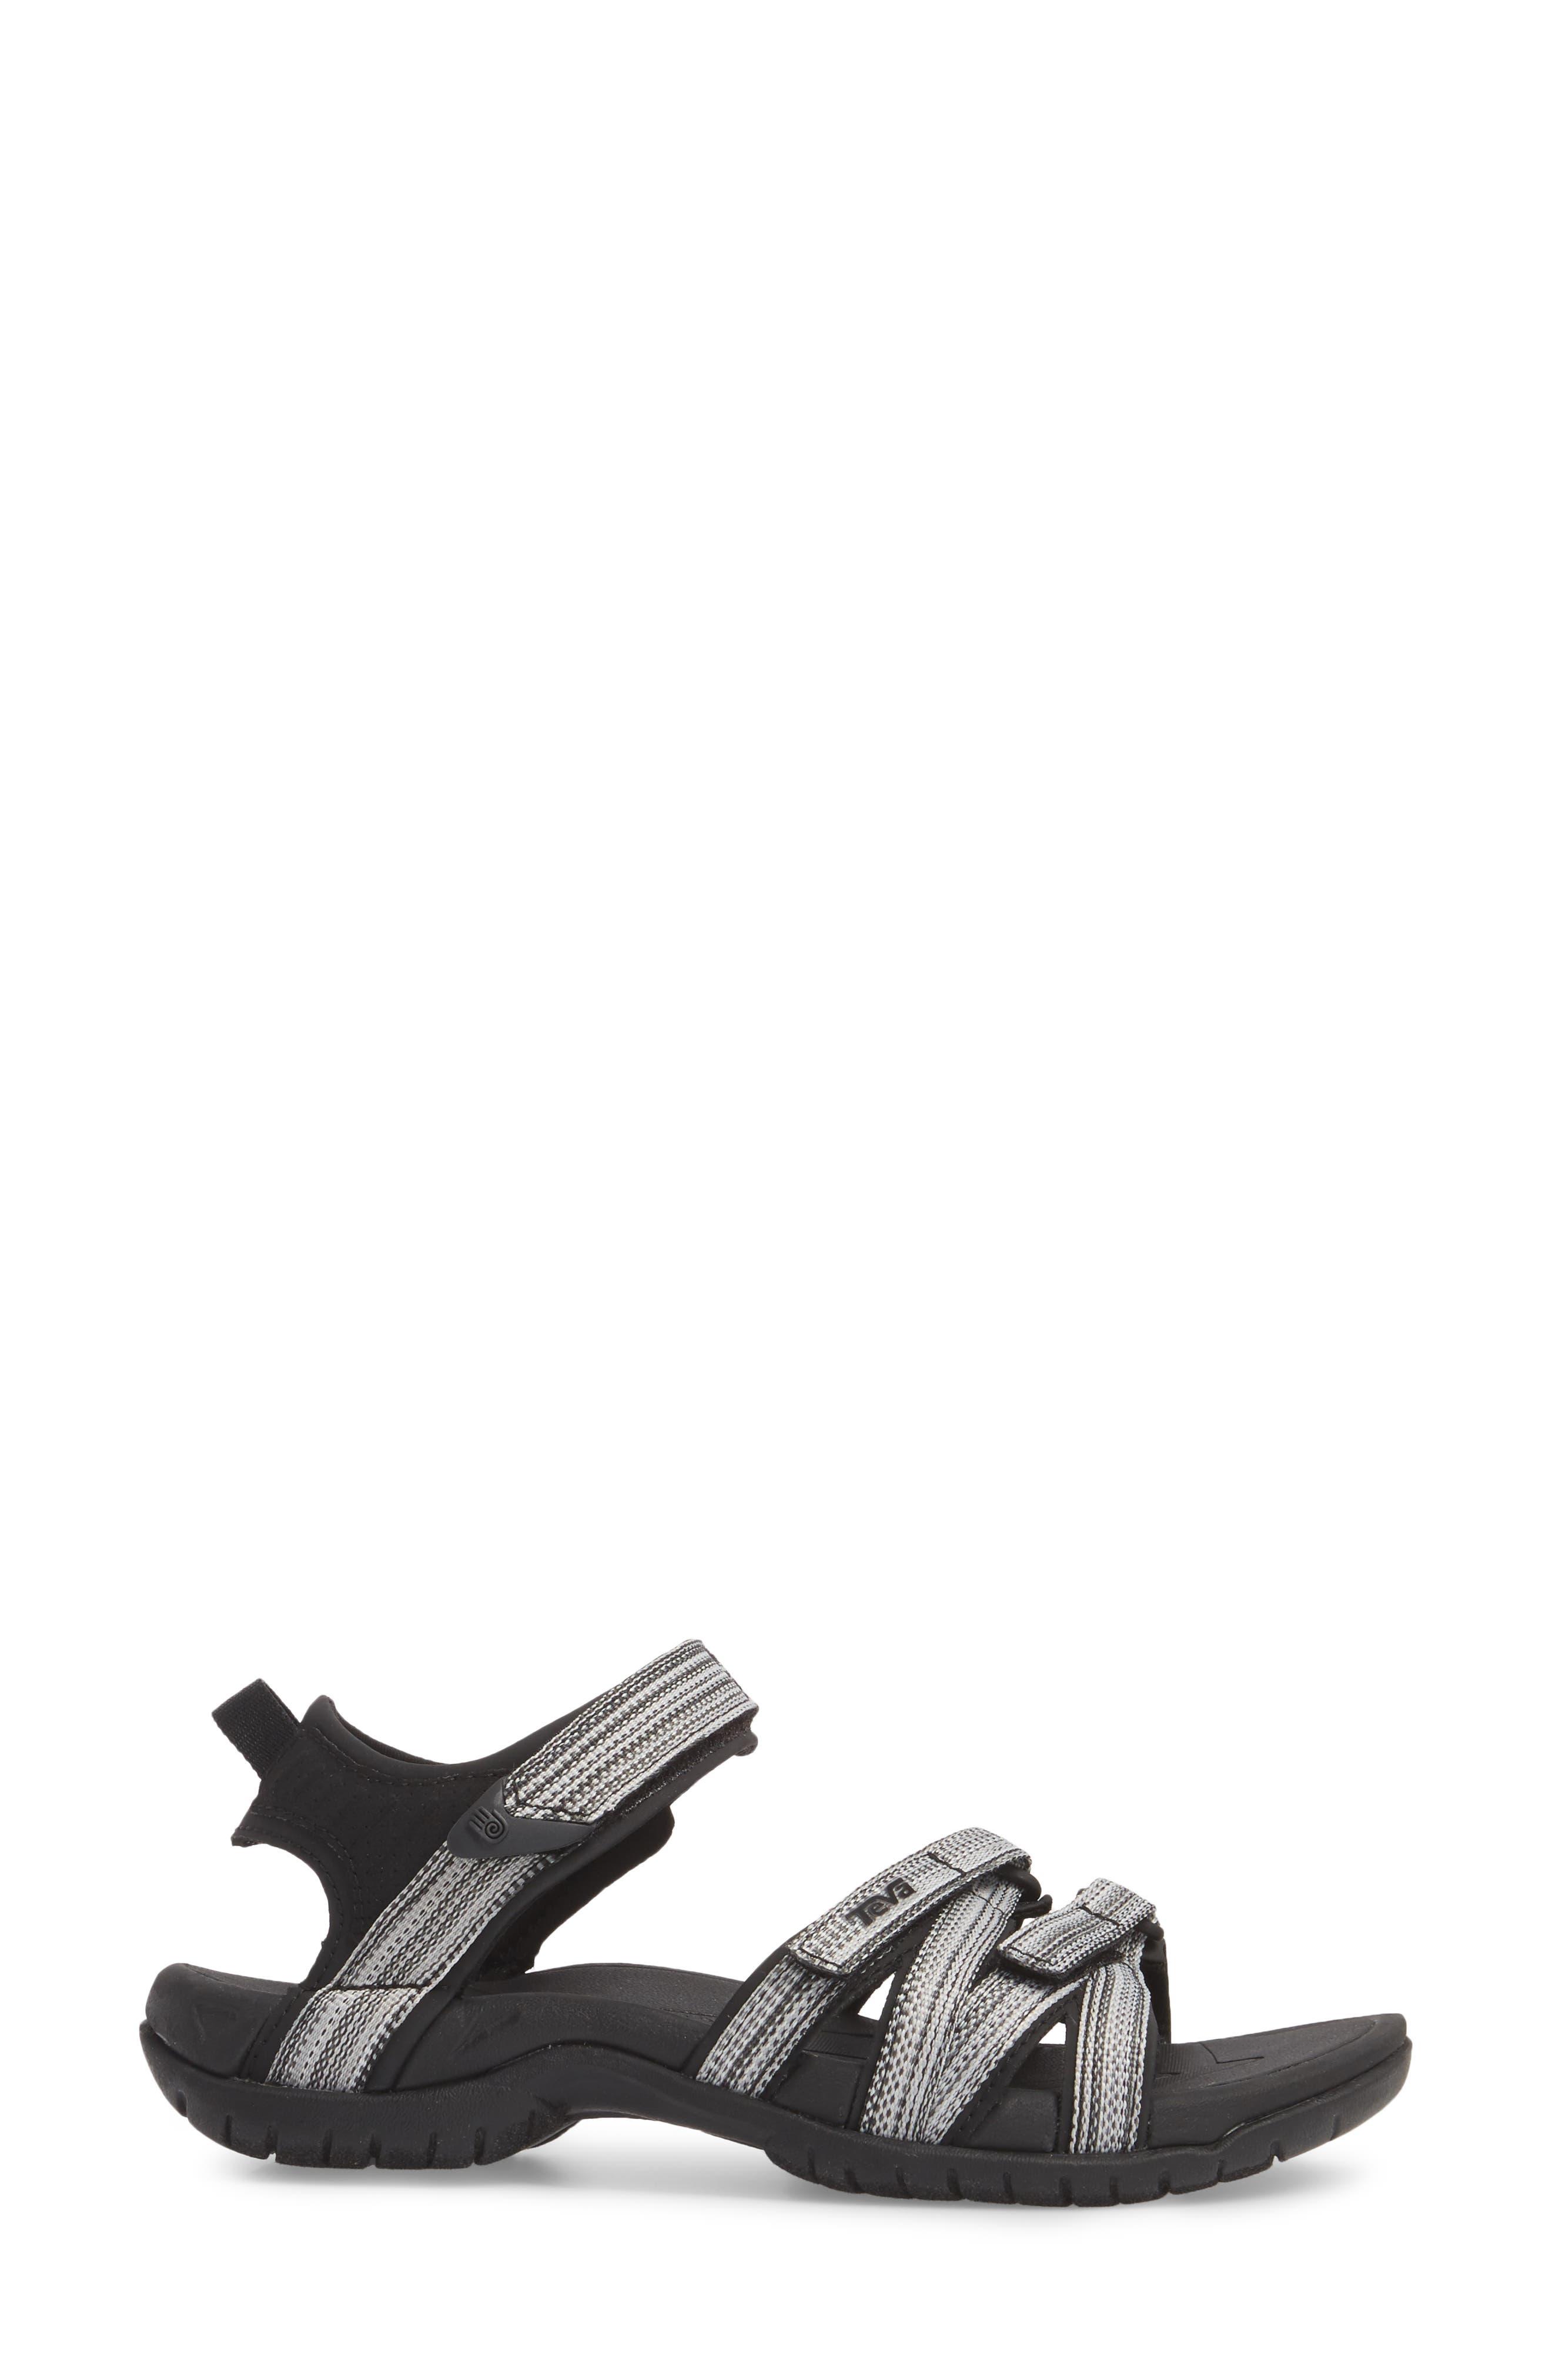 'Tirra' Sandal,                             Alternate thumbnail 3, color,                             Black/ White Multi Fabric